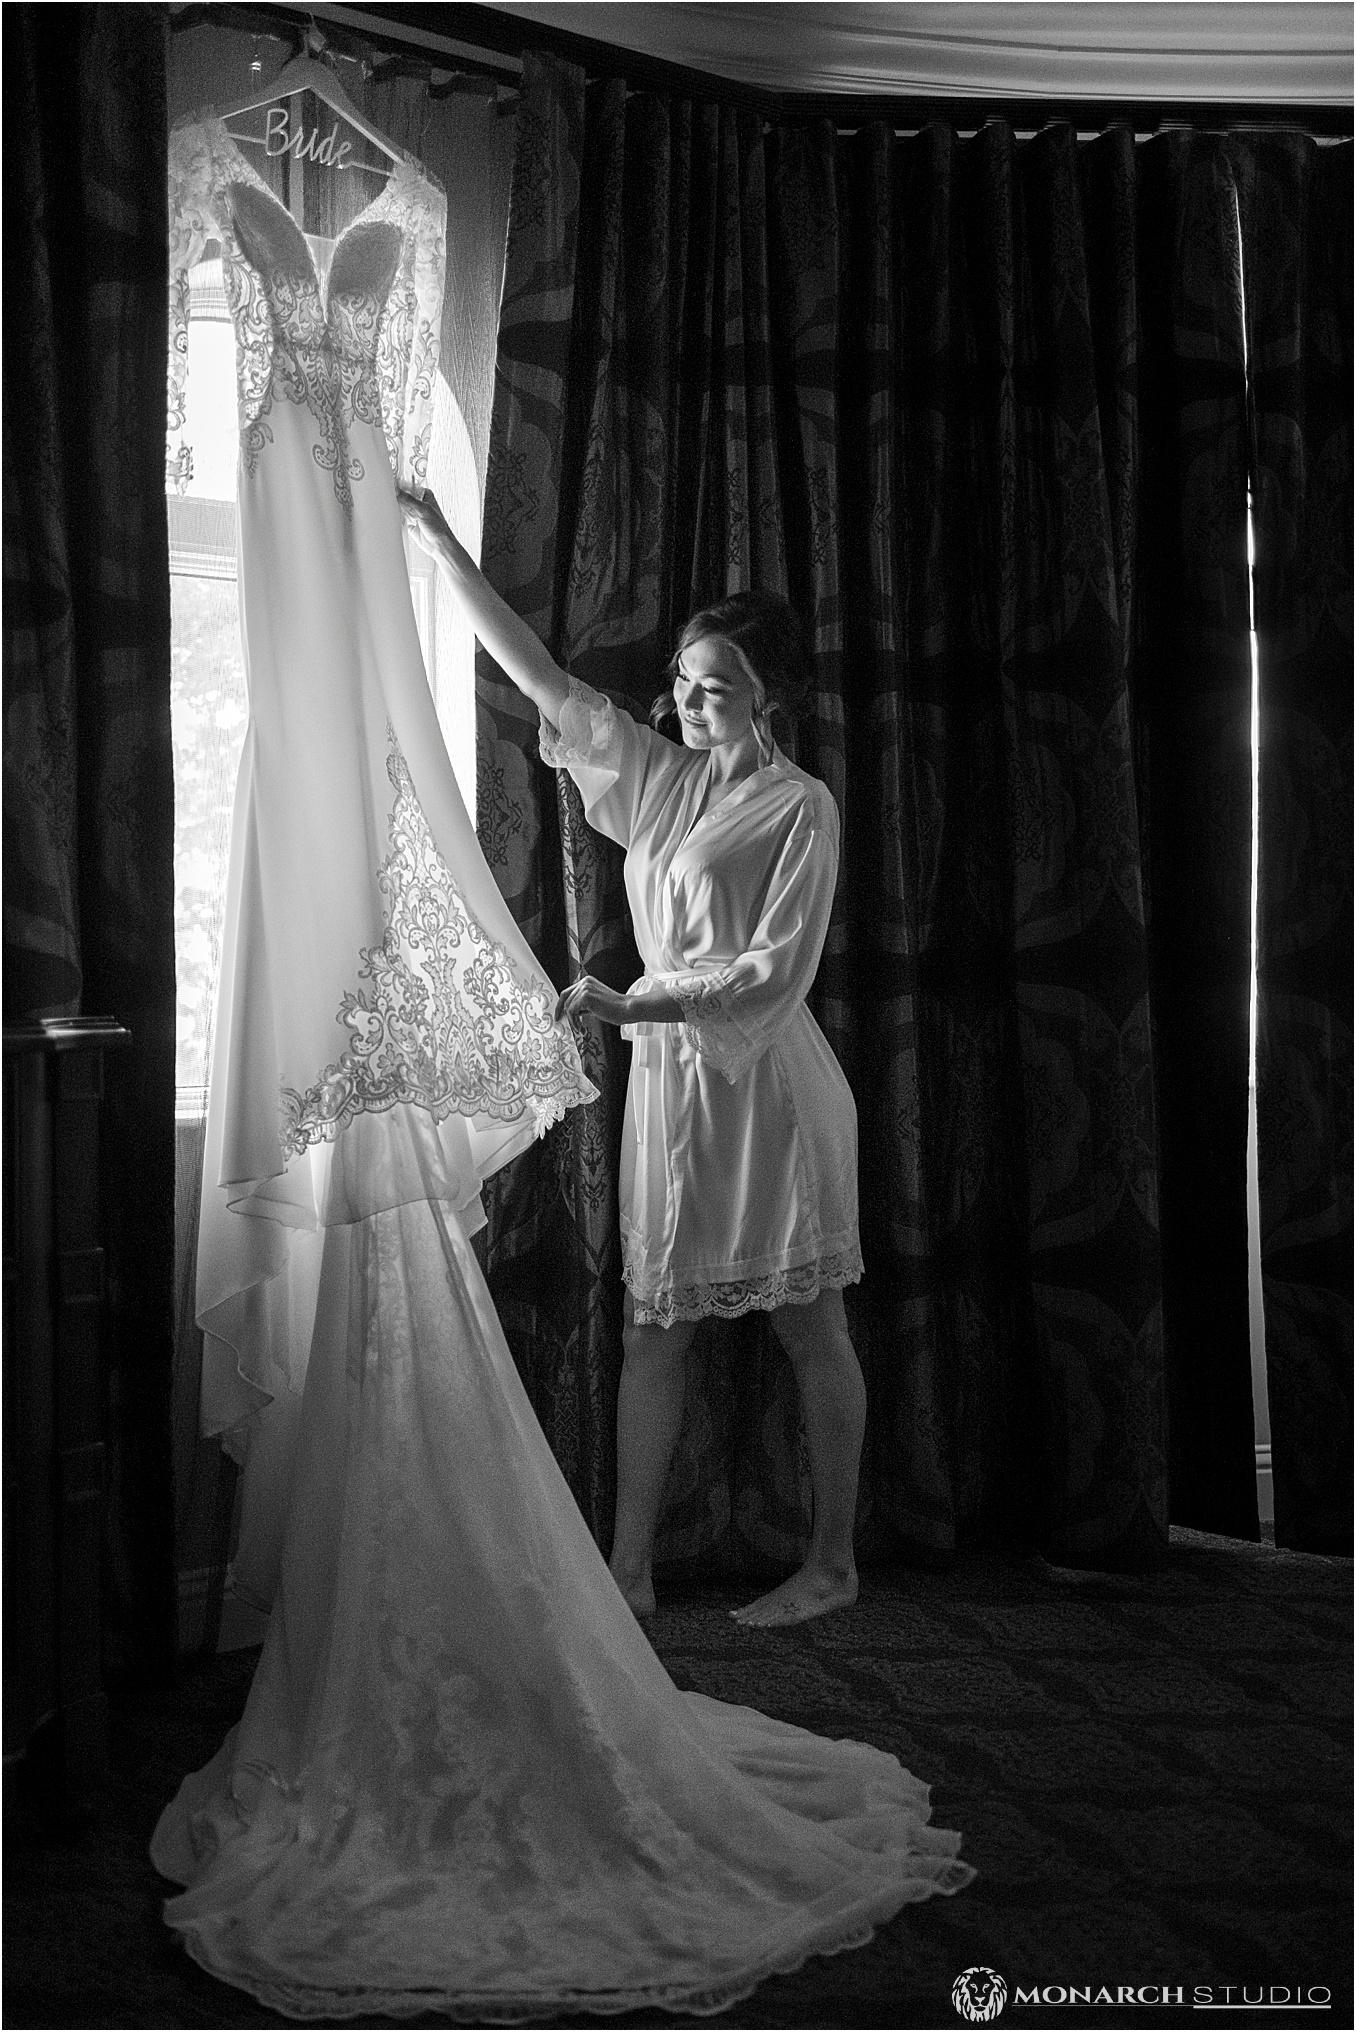 st-augustine-high-end-wedding-photographers-003.jpg